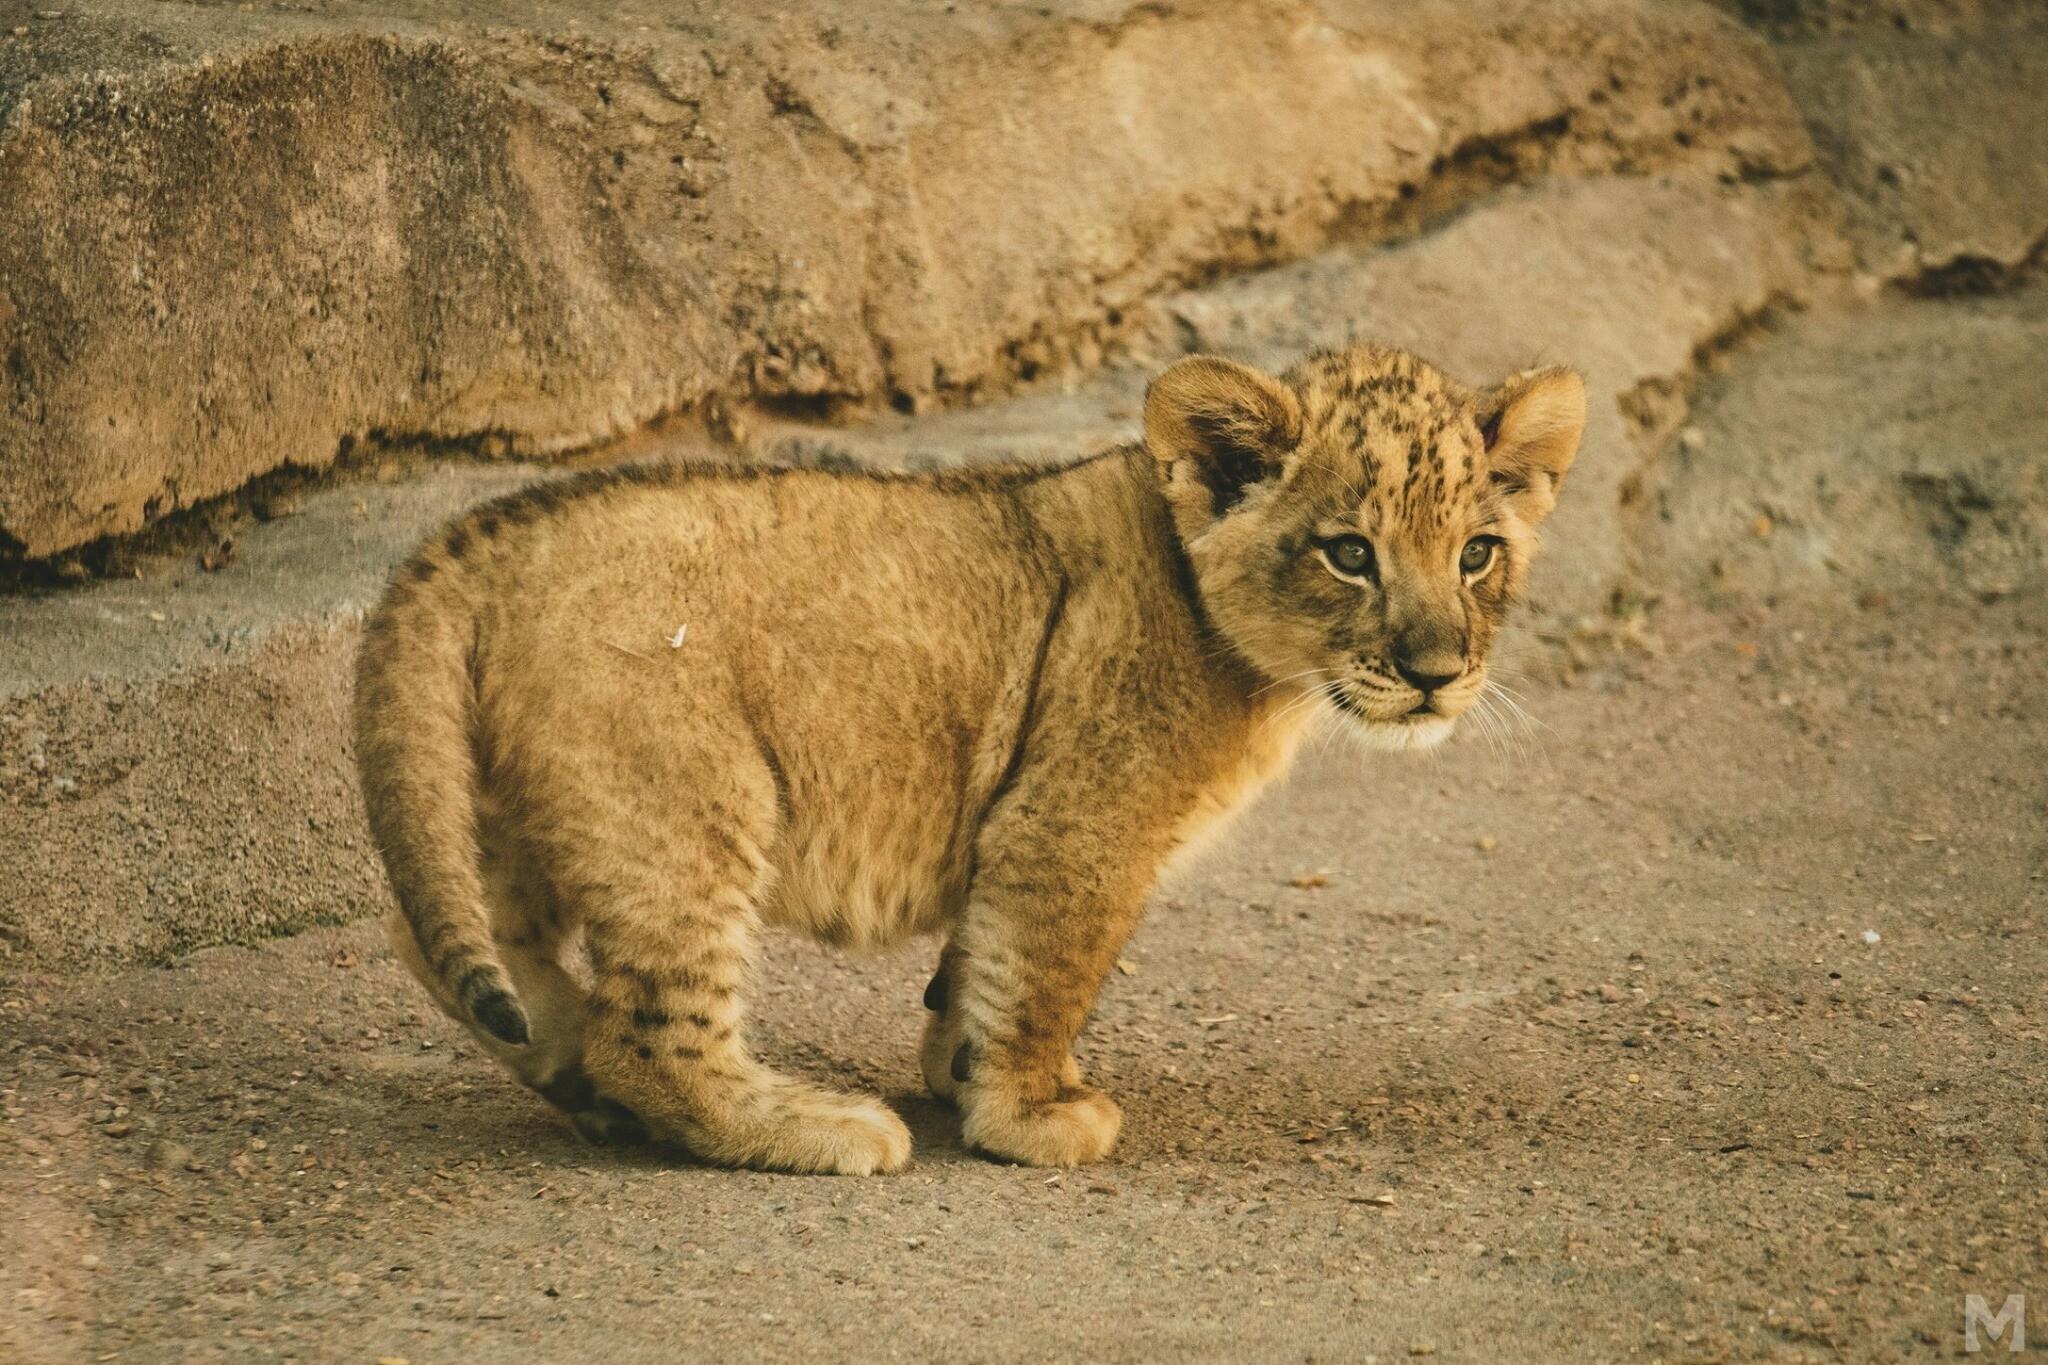 Lion Cub_13_Molly McCormick.jpg